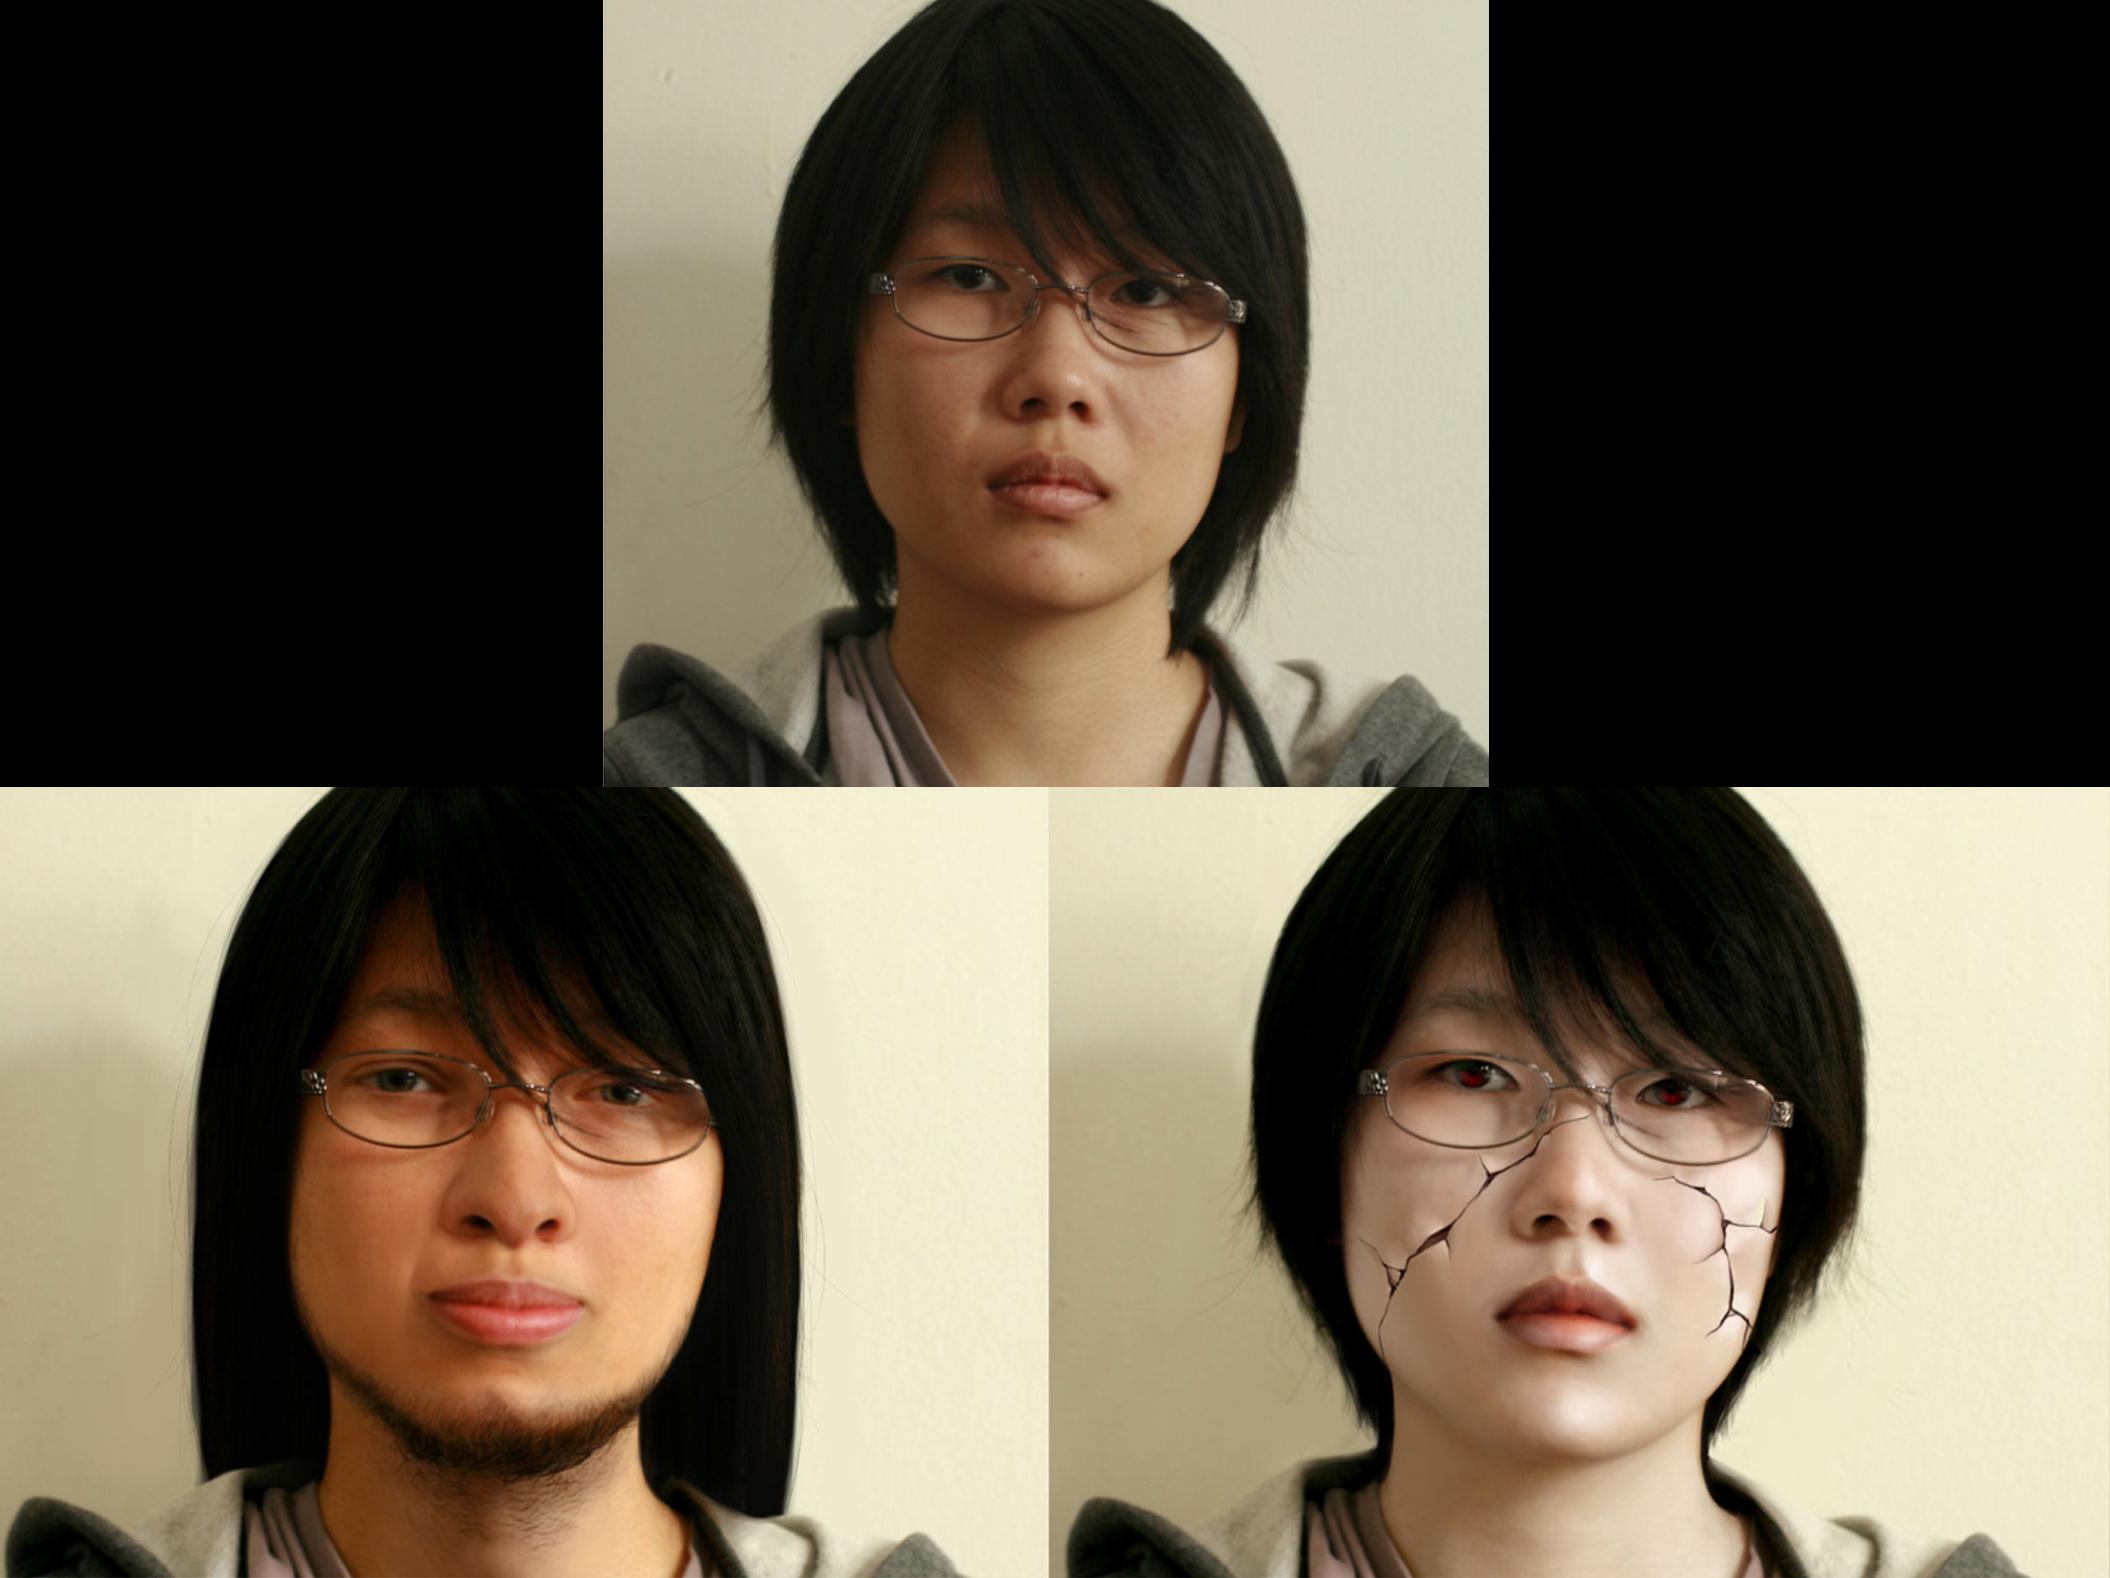 Media Studio: Imaging - Photoshop Portrait Project